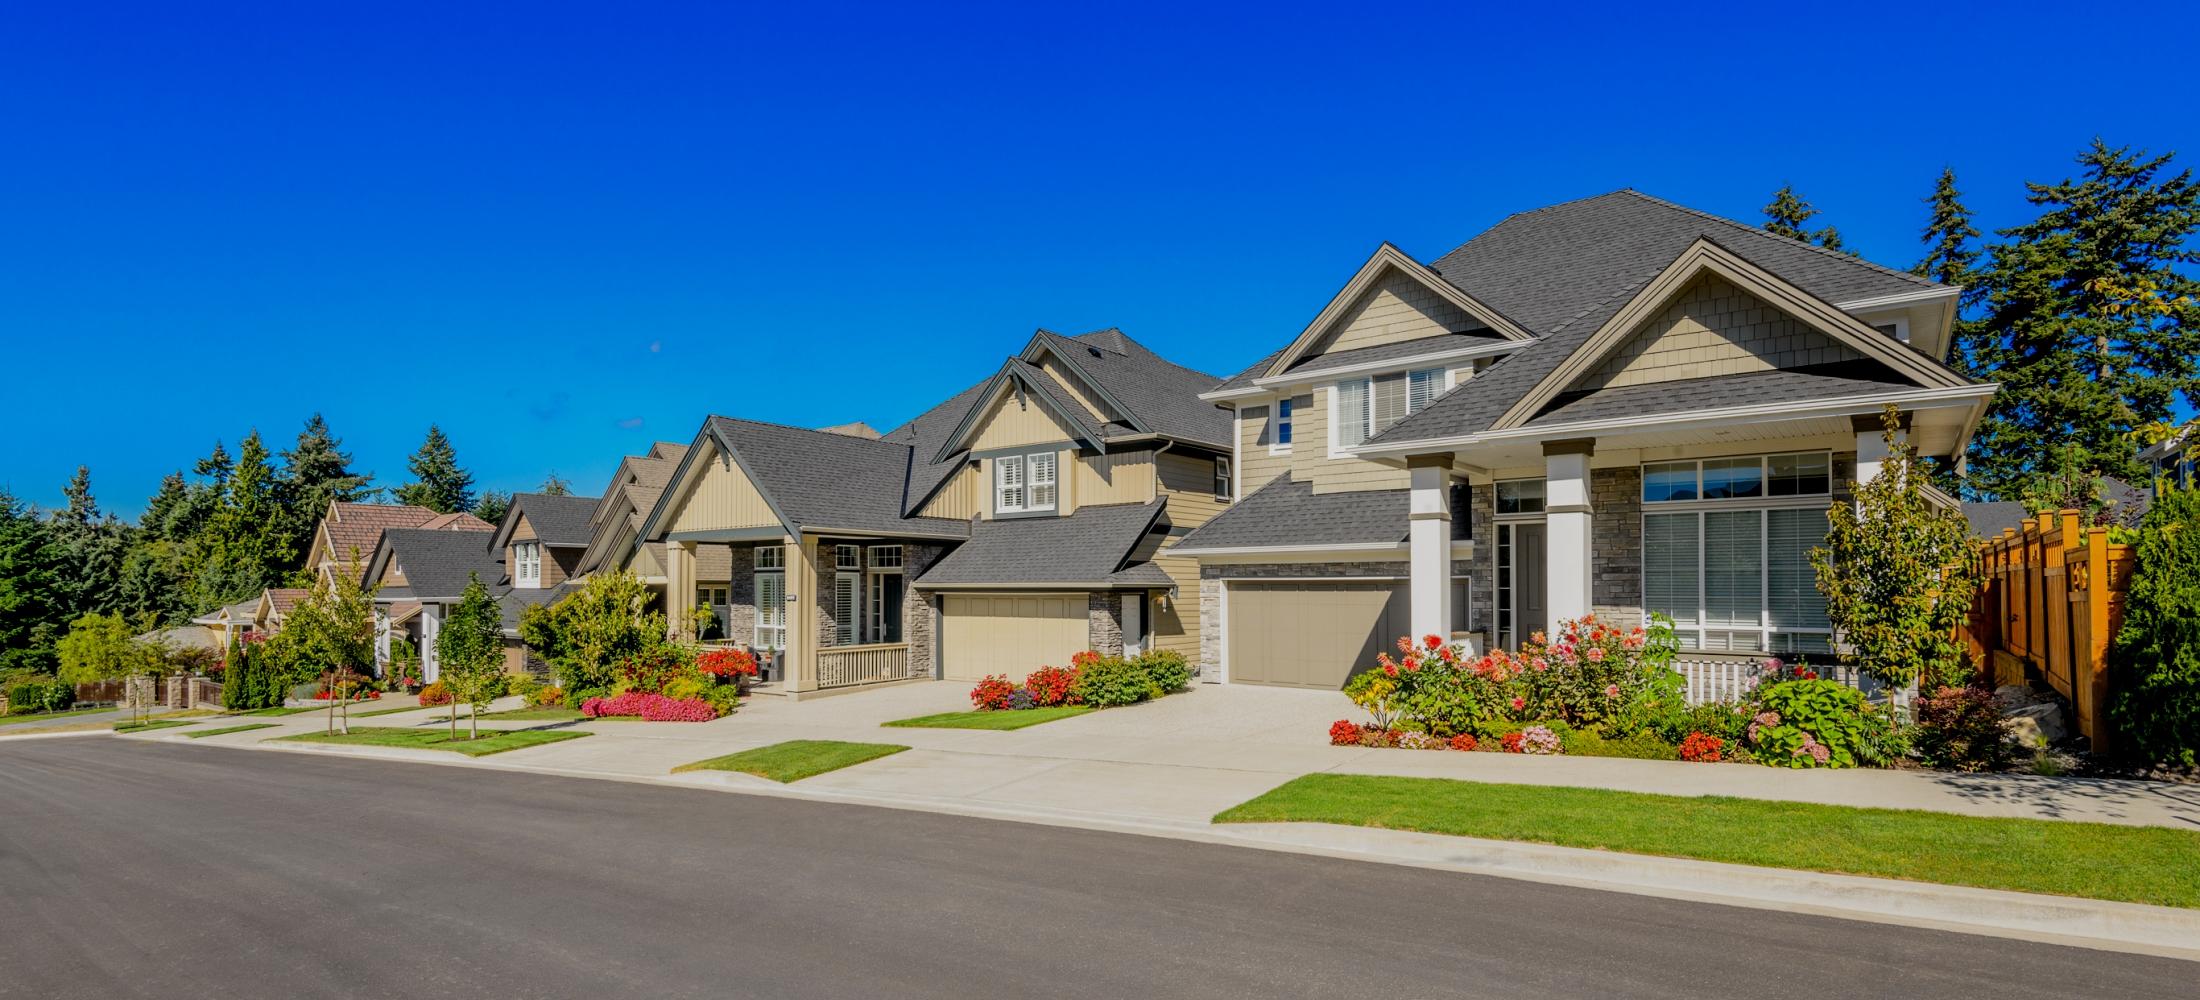 Wichita ks real estate wichita homes and condos for sale for Wichita home builders